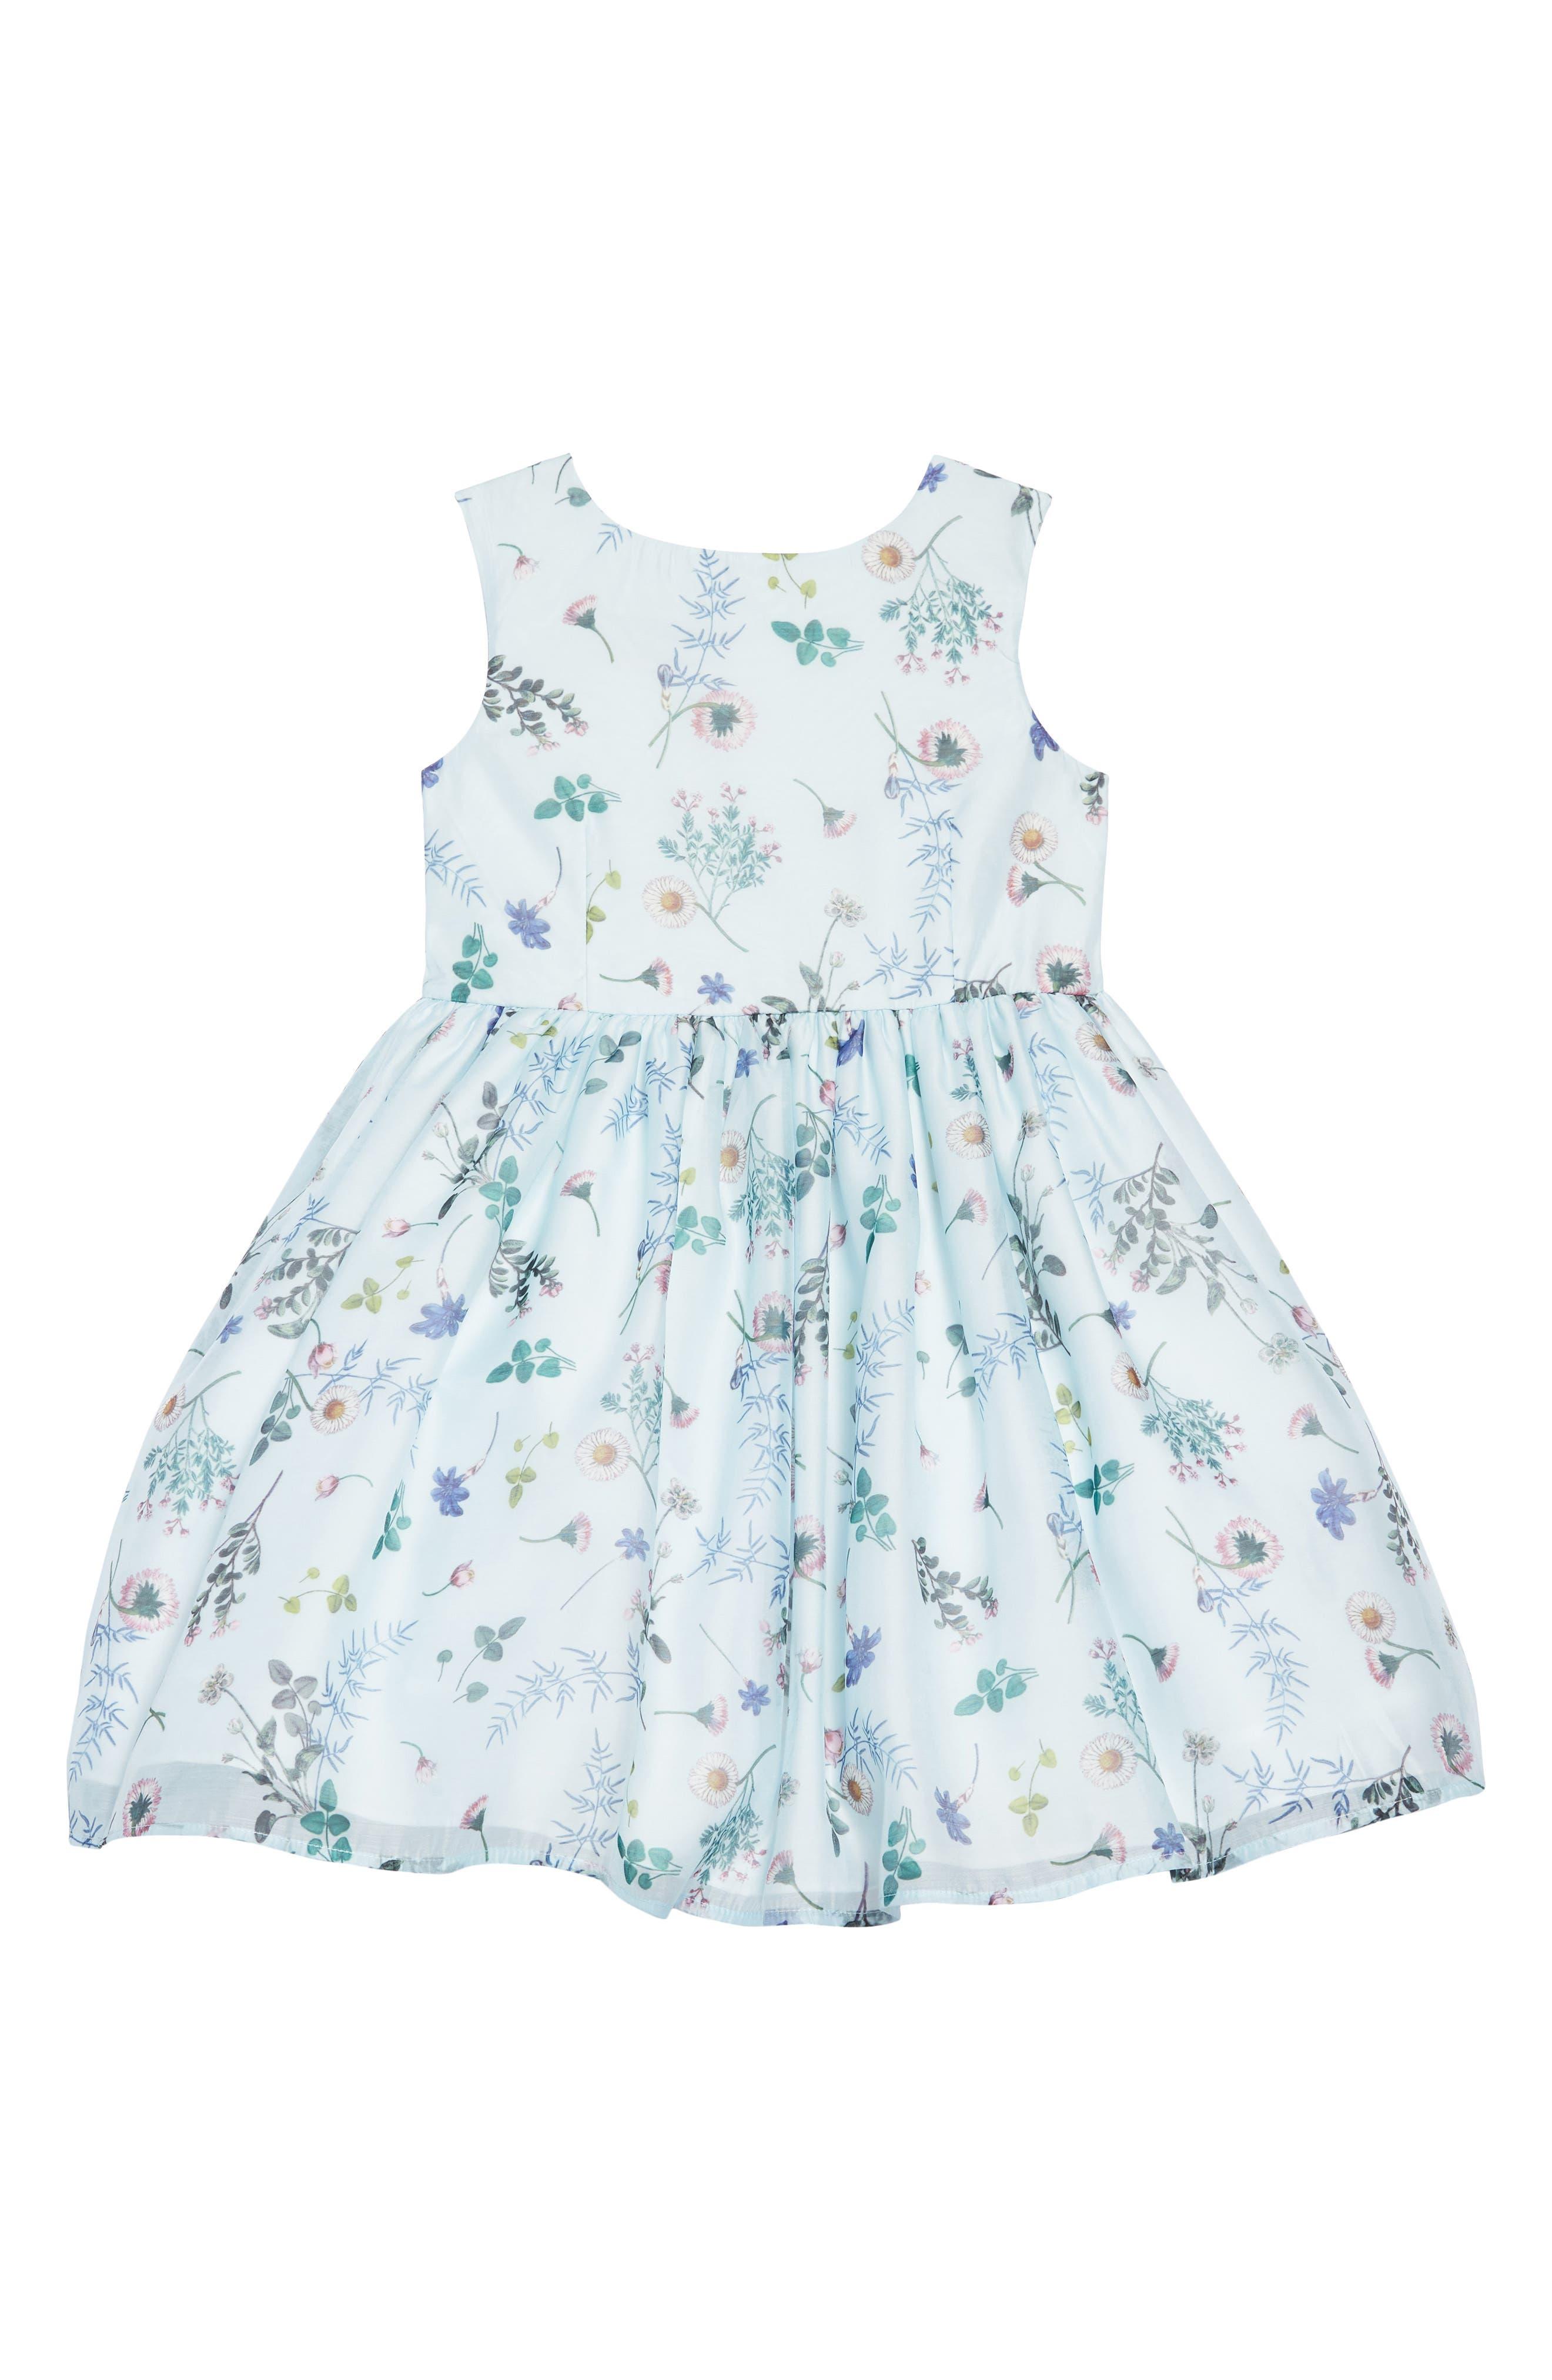 Wildflower Dress,                             Main thumbnail 1, color,                             MULTI